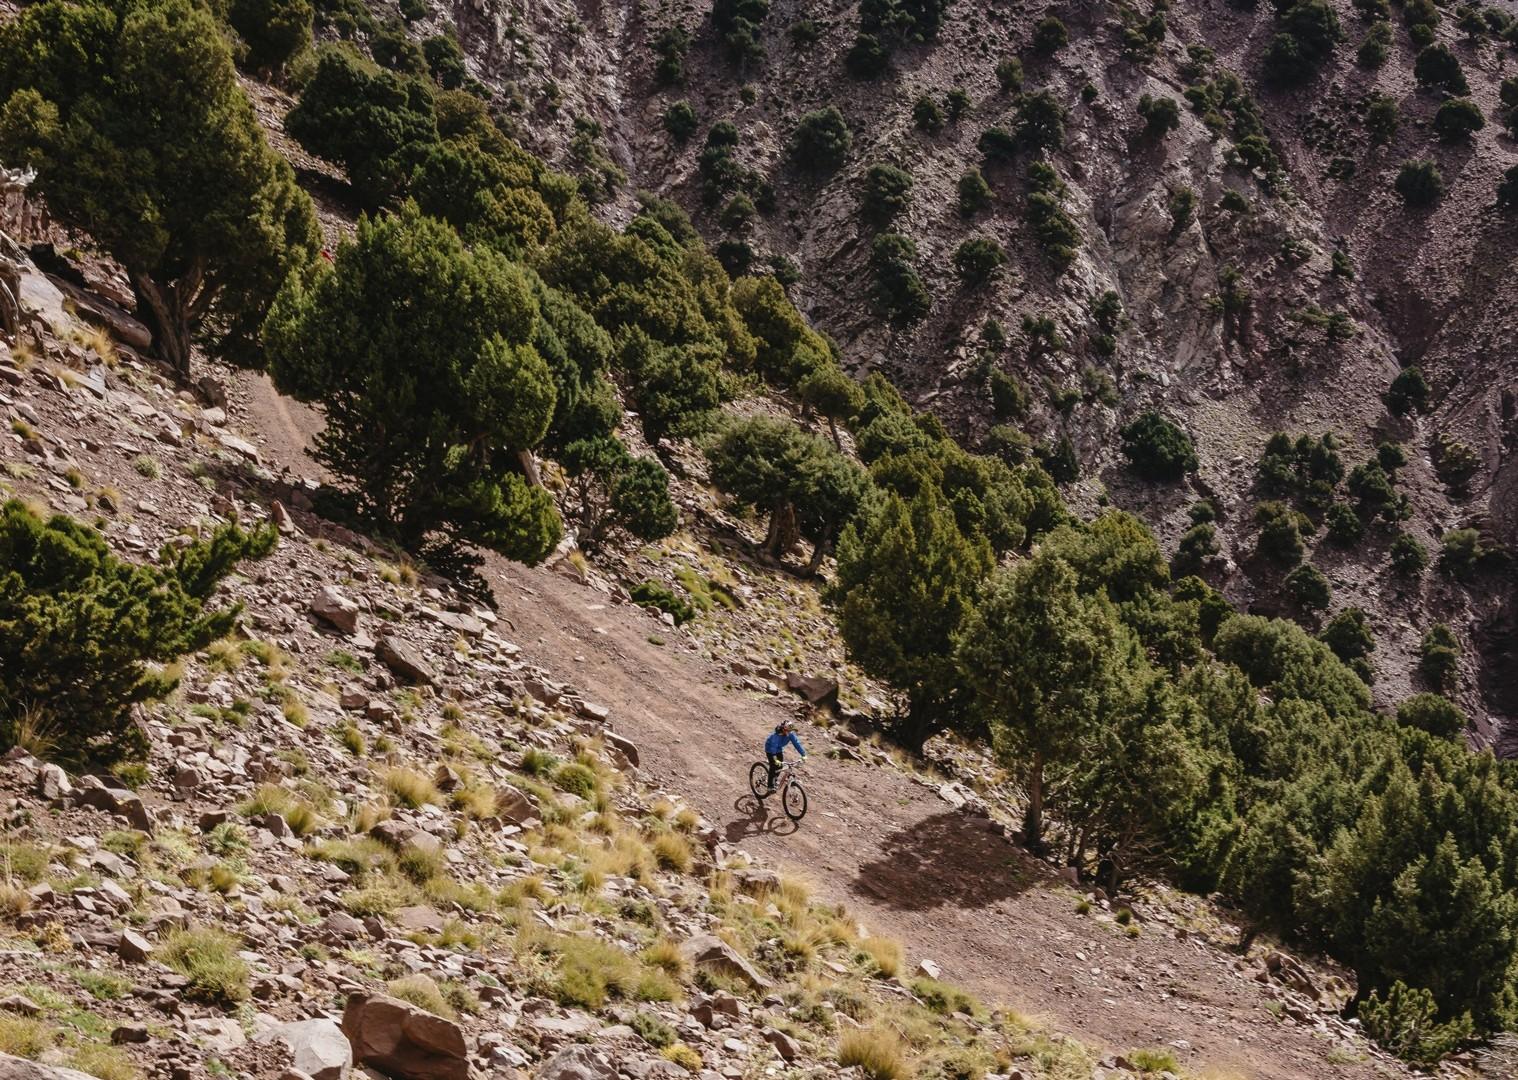 mountainbiking-morocco-atlas.jpg - Morocco - Atlas to Desert - Guided Mountain Bike Holiday - Mountain Biking